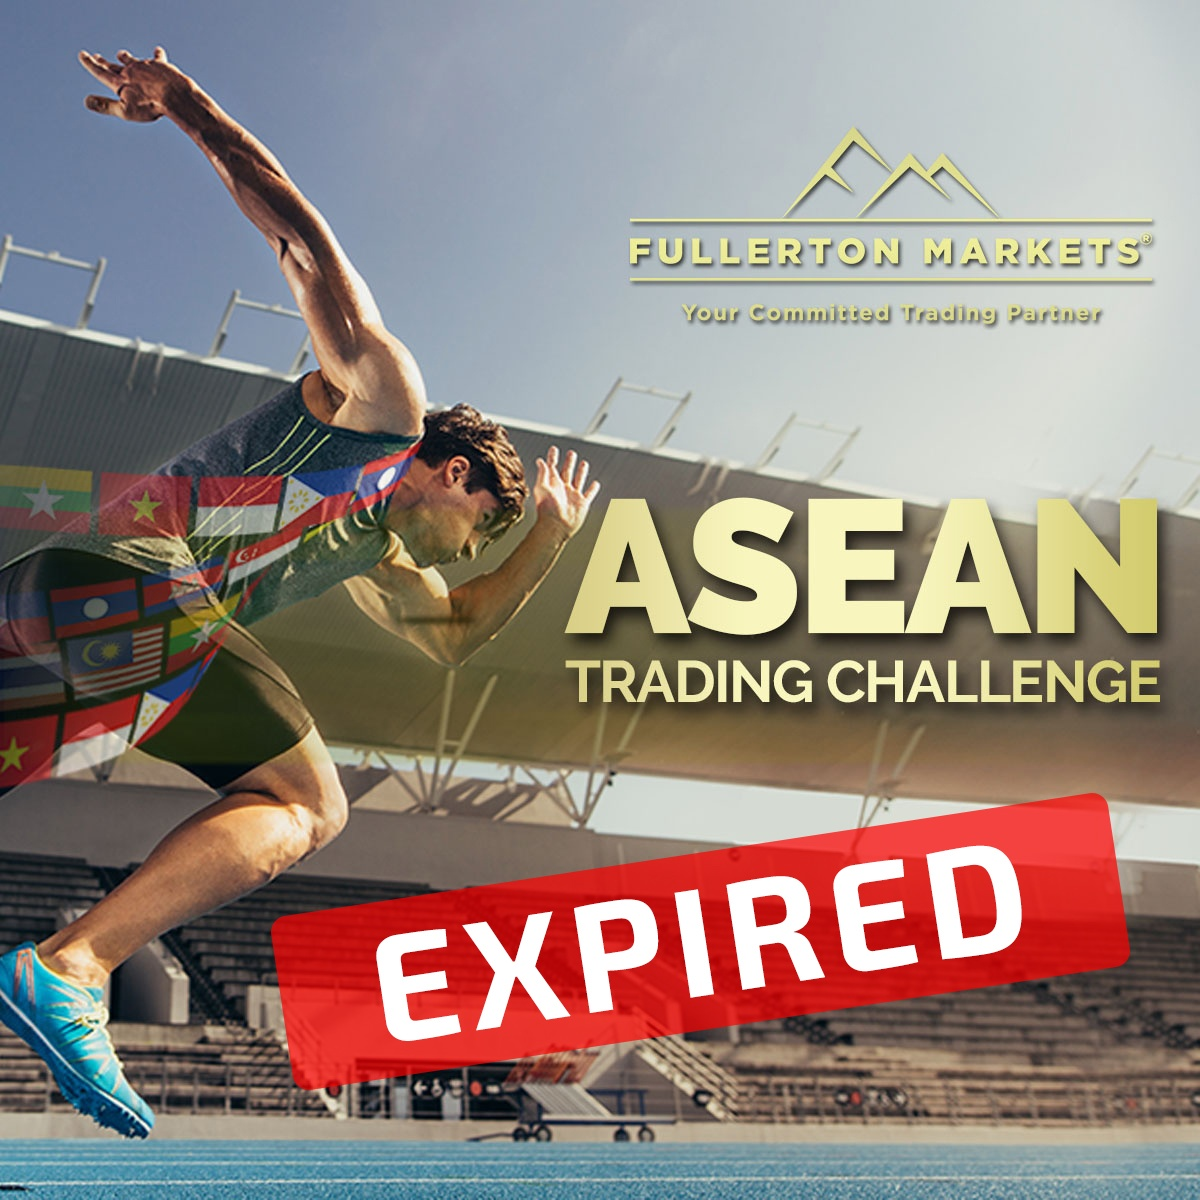 asean-trading-chellenge_IG_1200x1200_expired